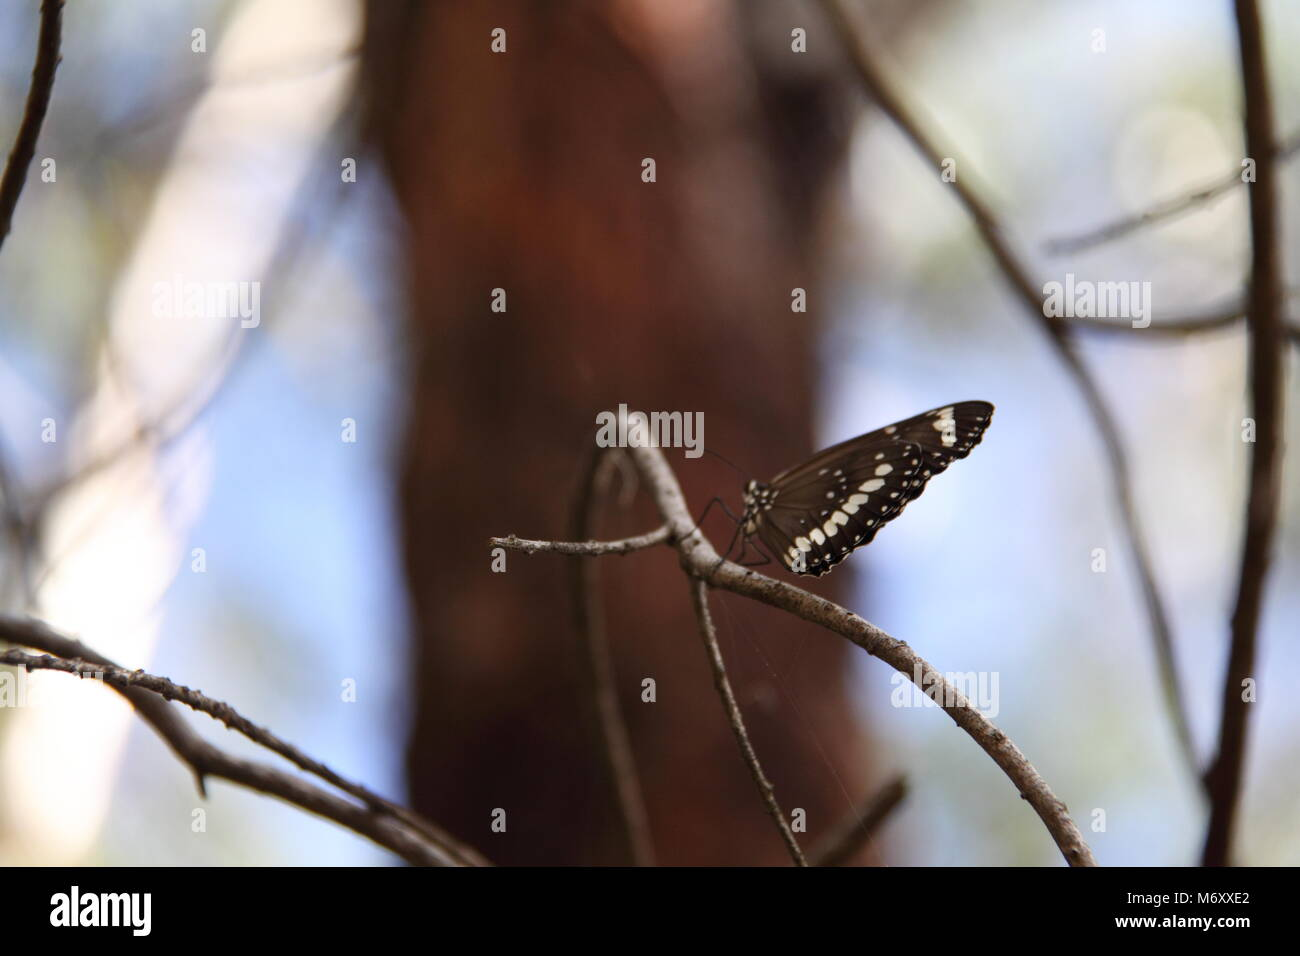 Common Crow Butterfly (Euploea Core) - Stock Image